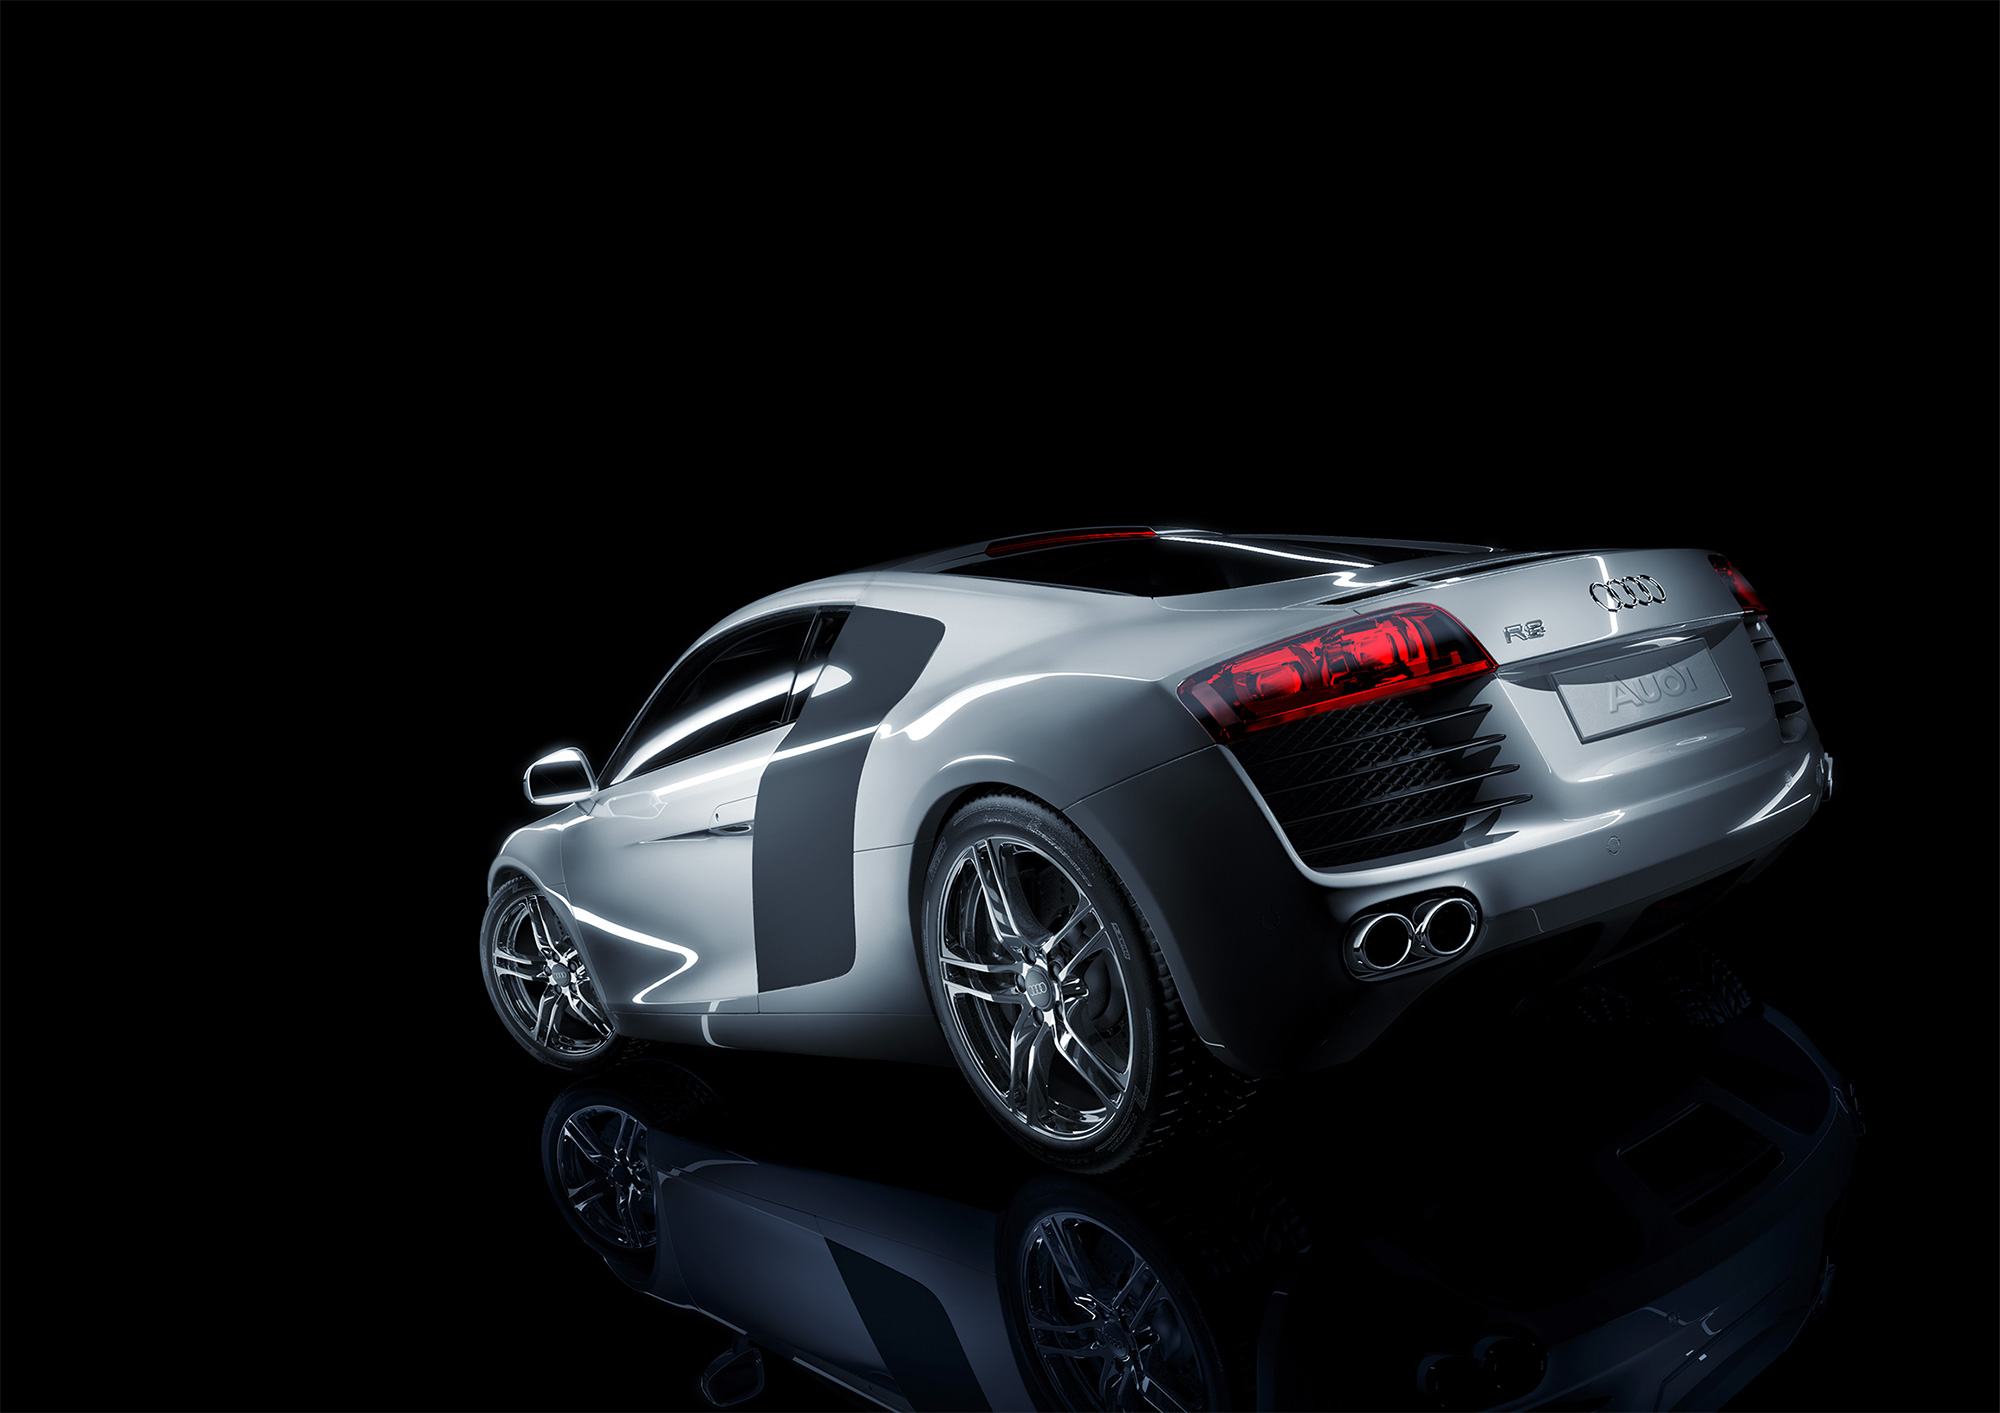 CGI Rendering 3d Audi R8 Auto Studio Neon Strip HDRI Backplate Sphere Idris Kolodziej